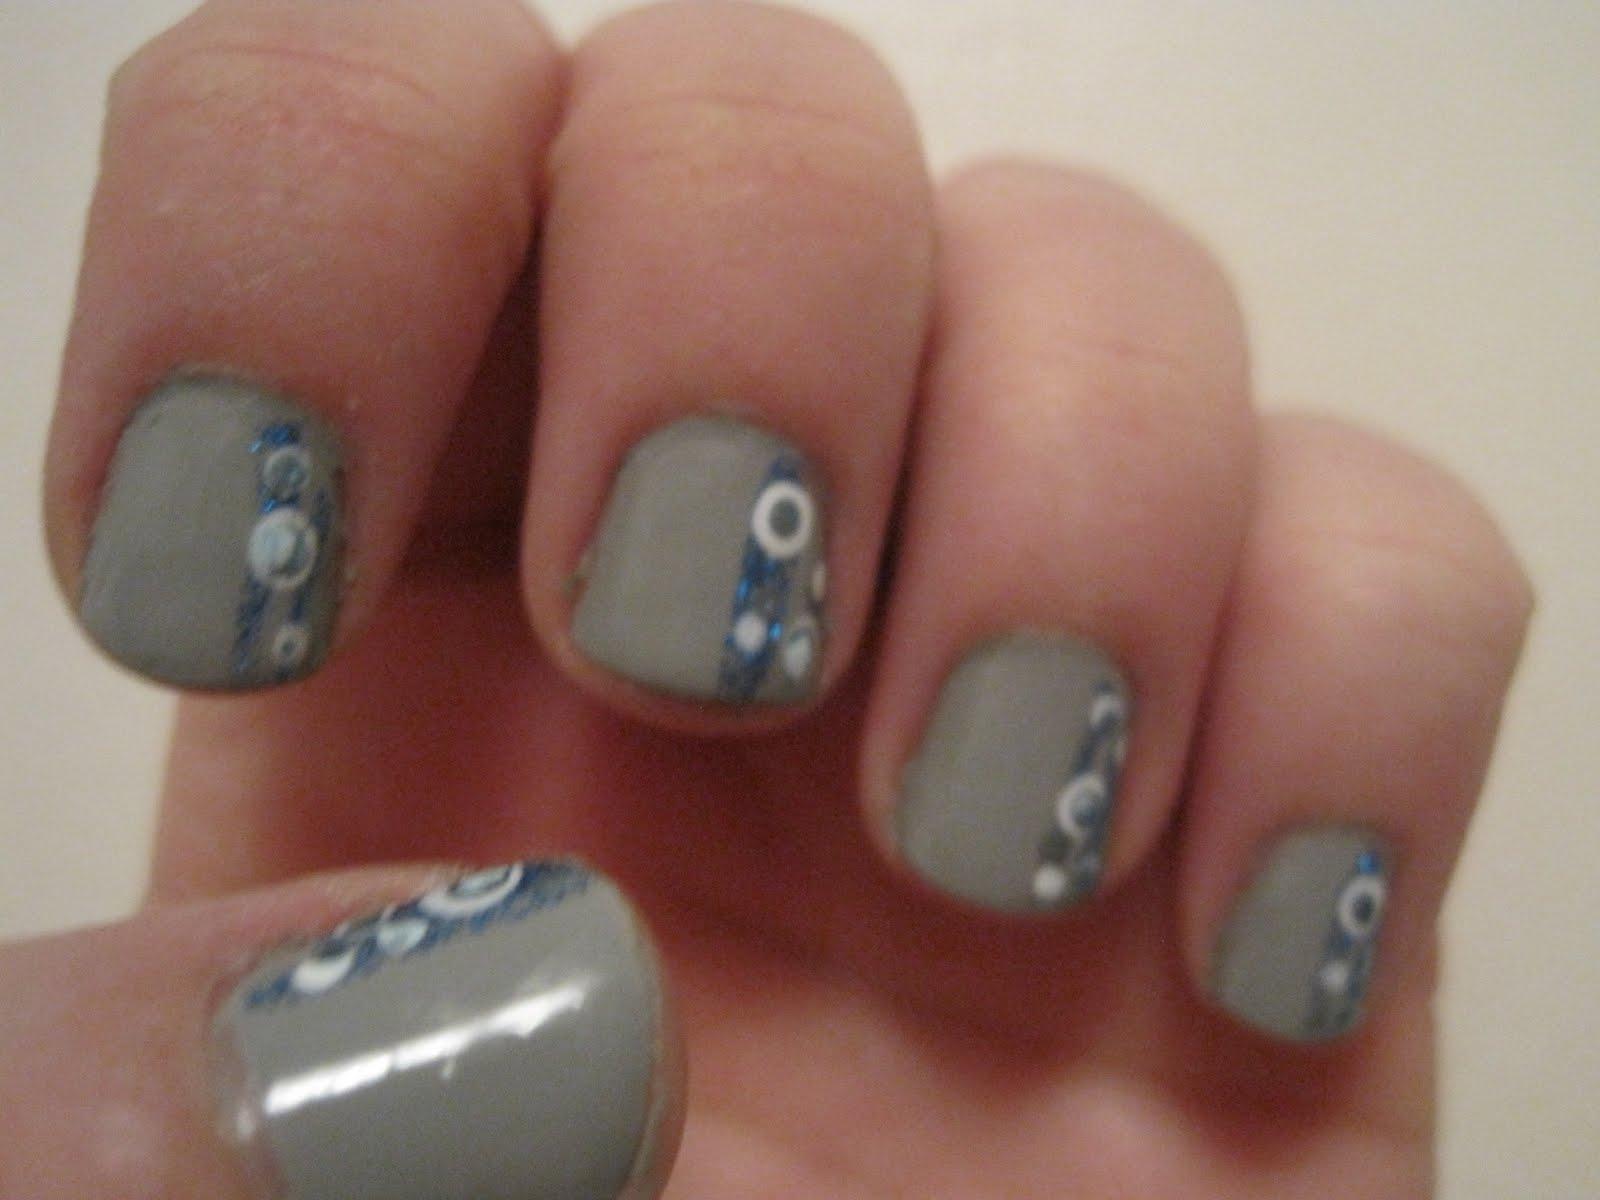 Alikat789 Nail art: April designs so far